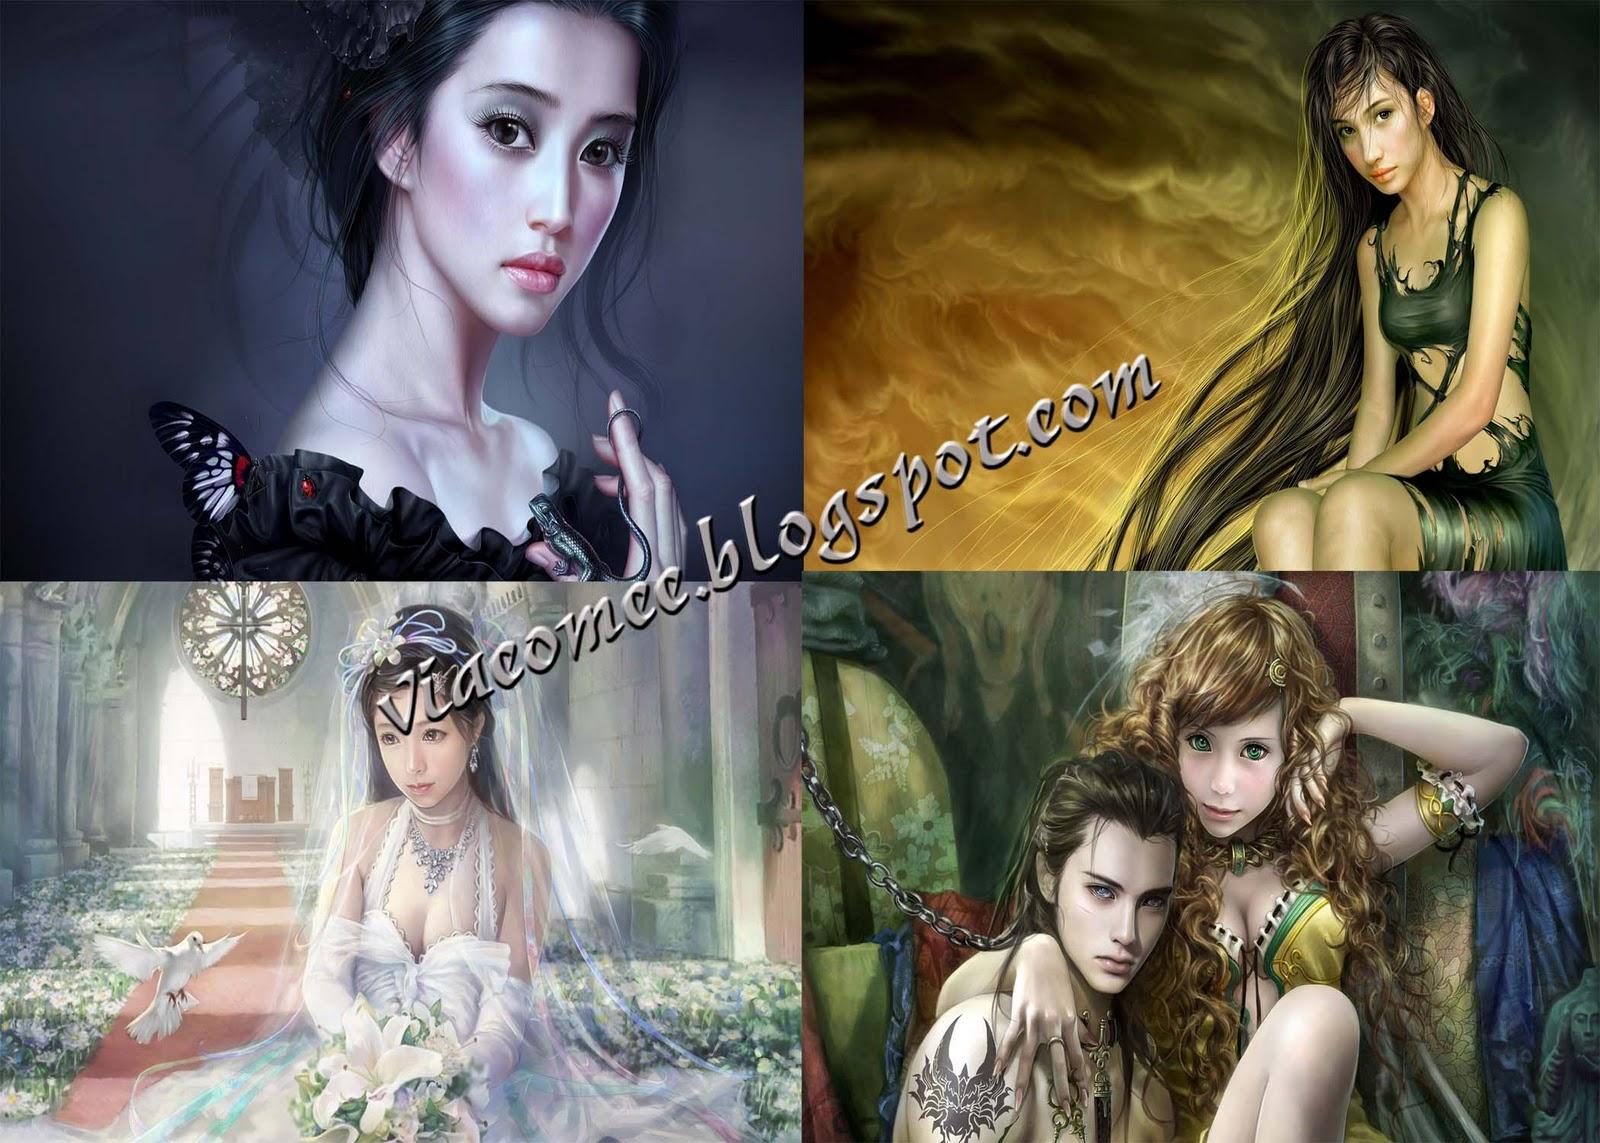 http://4.bp.blogspot.com/_RphxnciltFY/TNAr0FZ3PGI/AAAAAAAAASI/RQsat8c5Z6U/s1600/Amazing+Girls+38-46.jpg